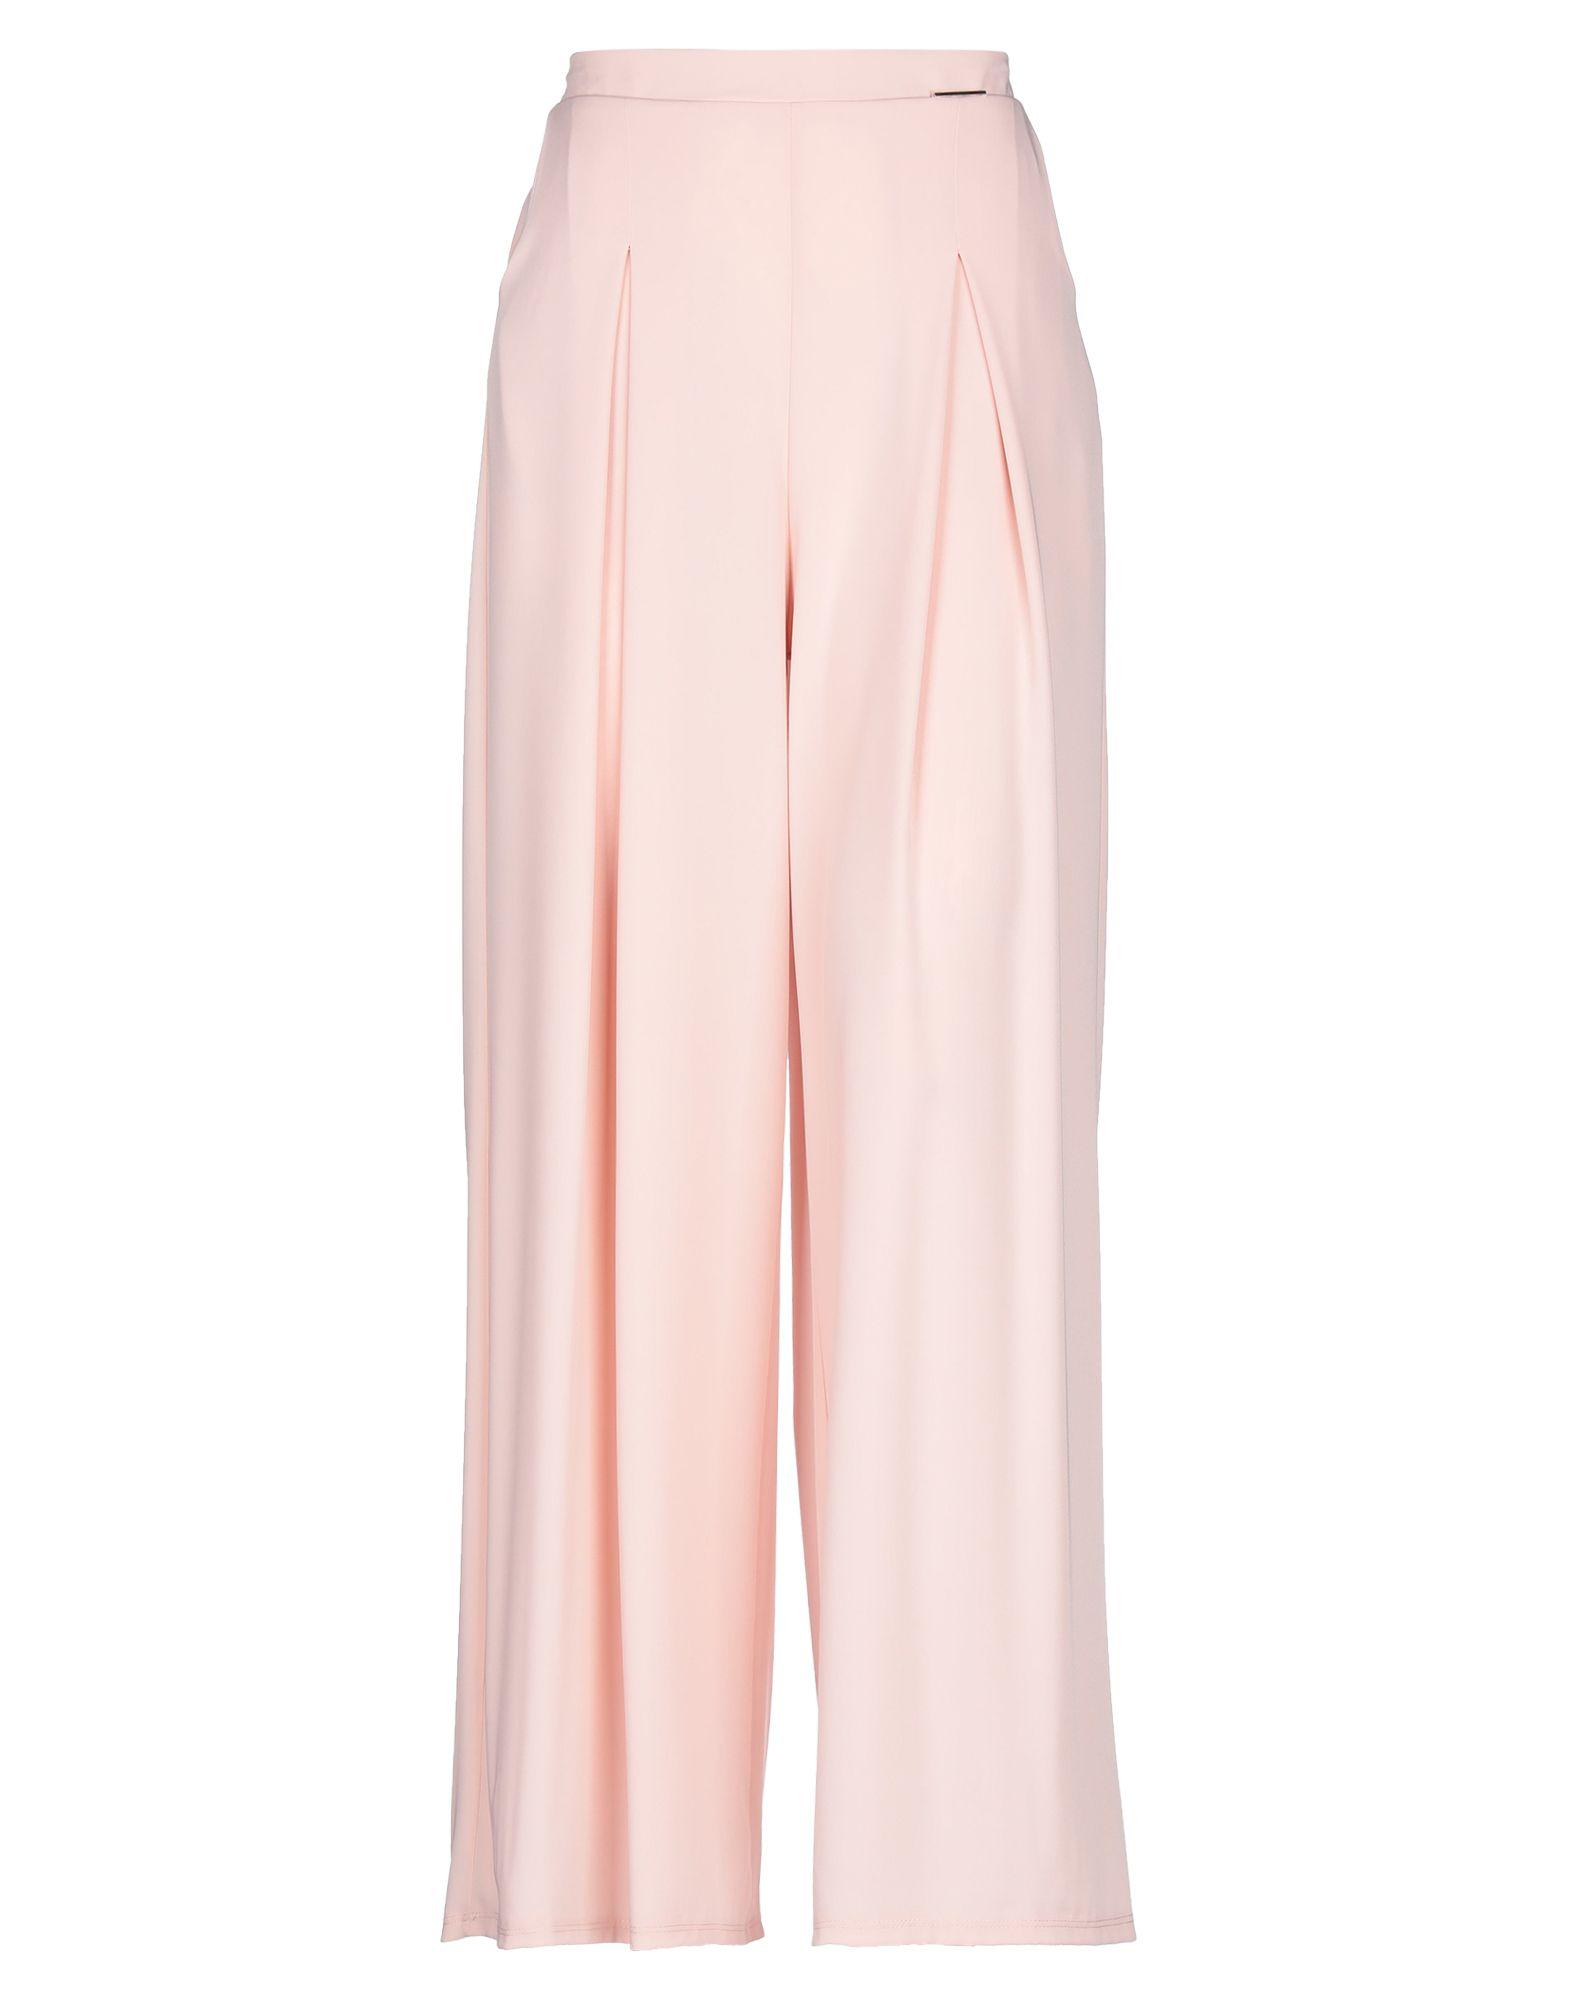 HELLEN BARRETT Повседневные брюки hellen barrett пиджак